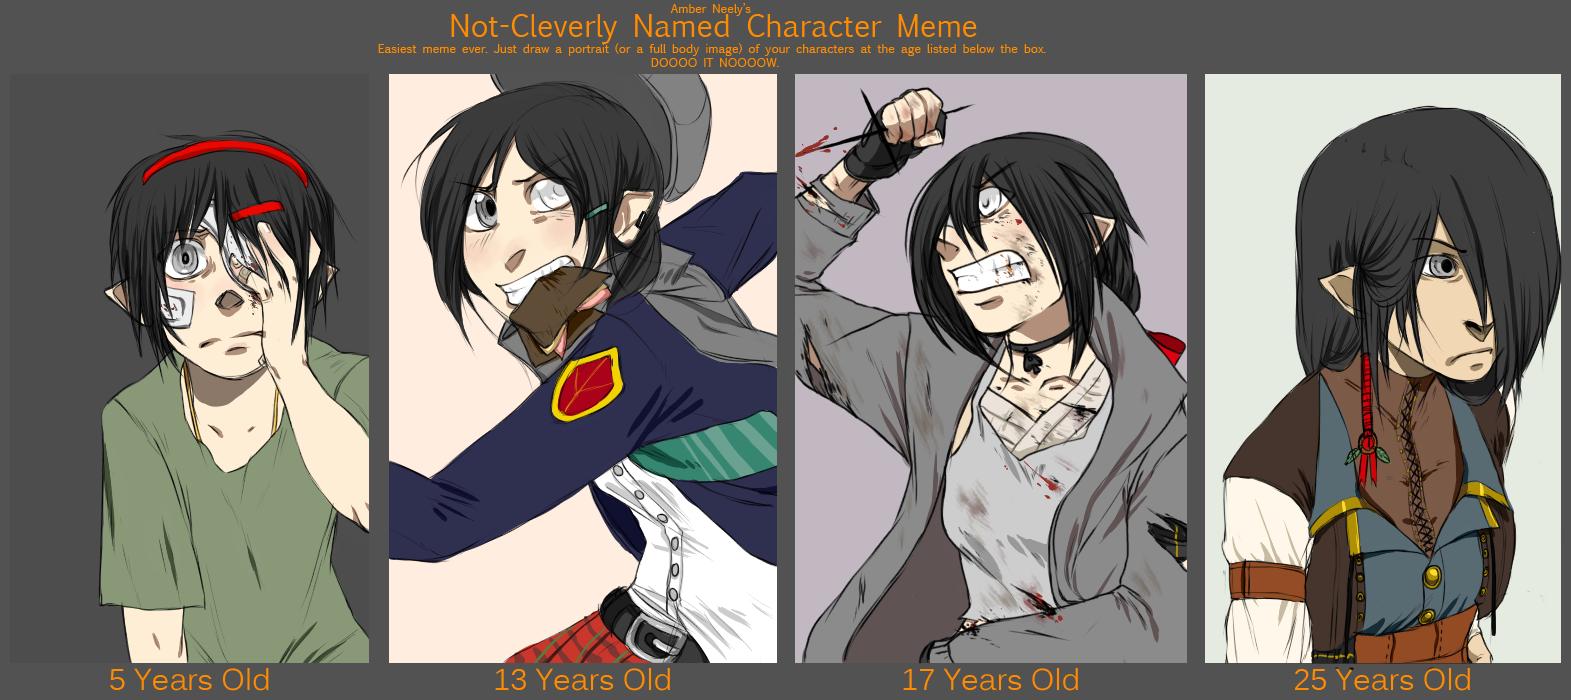 Anime Characters Age : Zan age meme by soojinp on deviantart